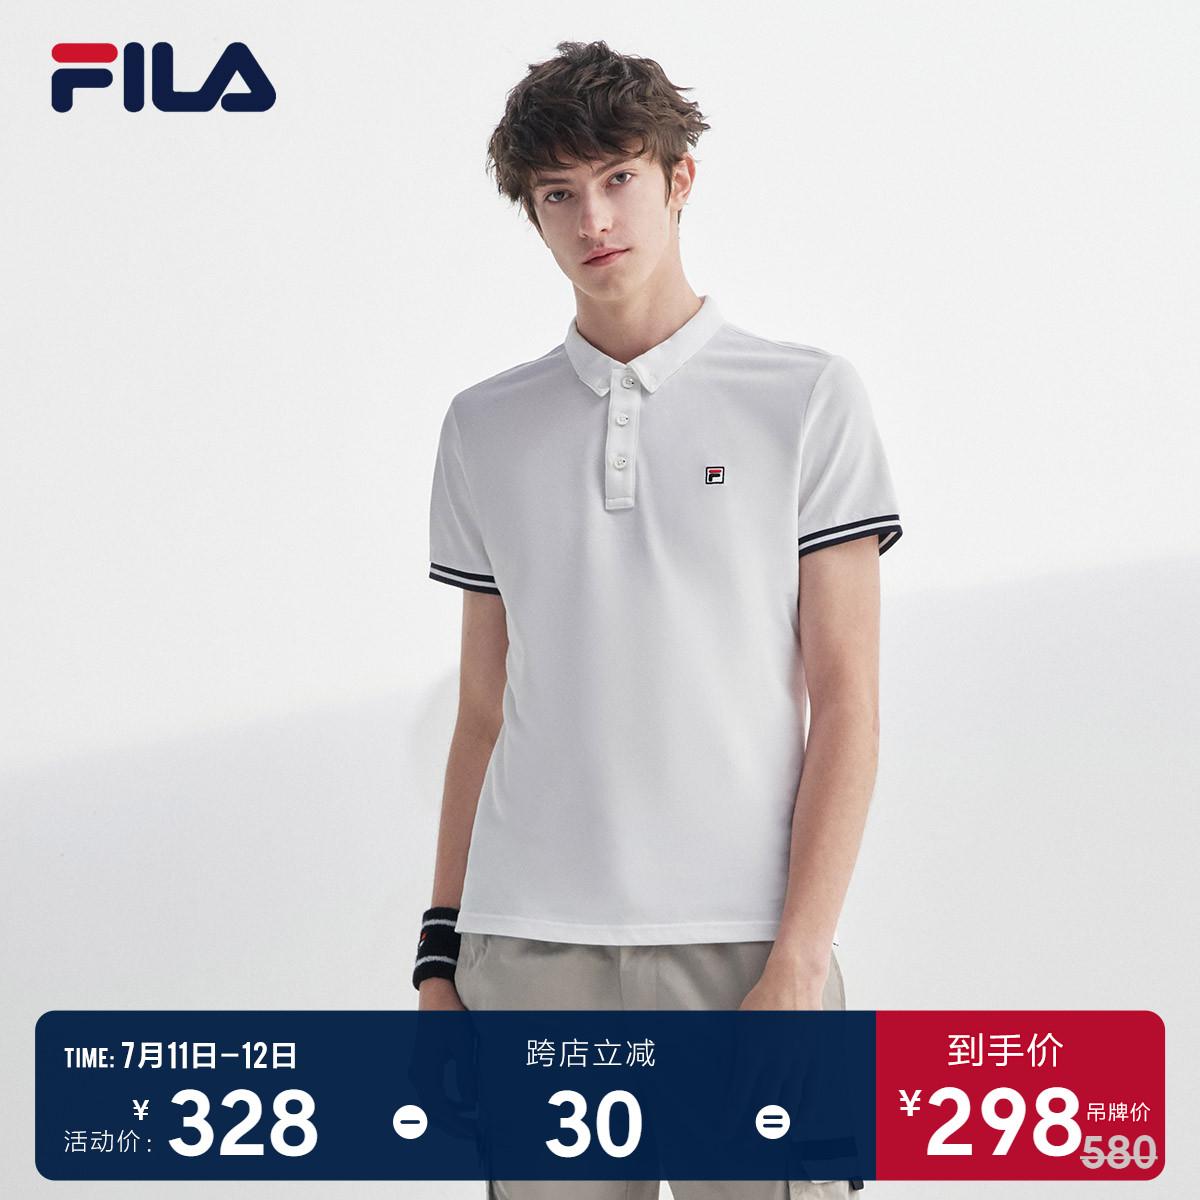 FILA 斐乐男子短袖POLO2020夏季新款时尚简约短袖衫男POLO